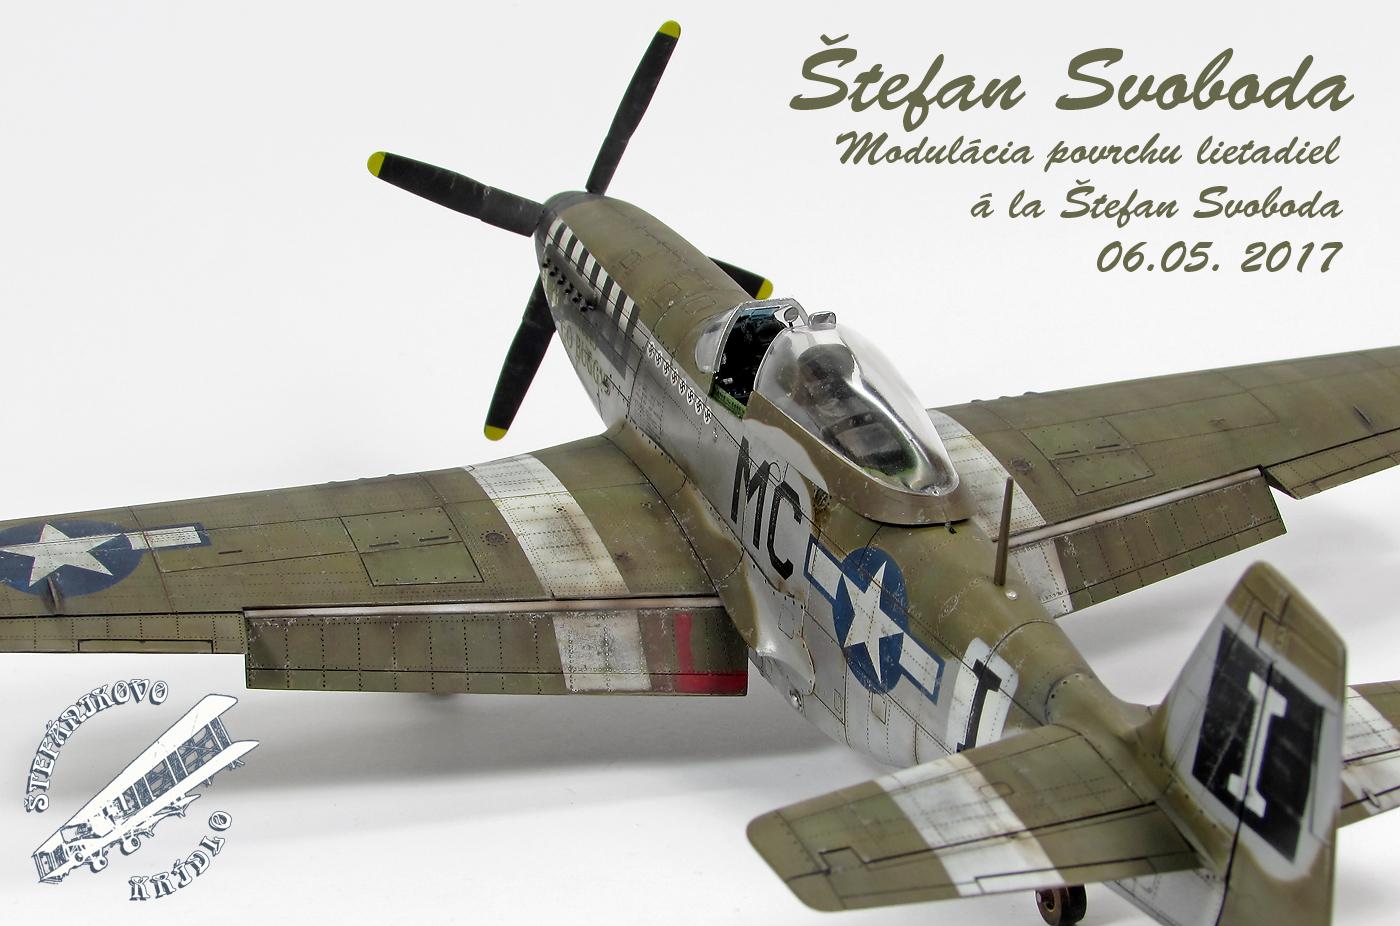 Modulacia-povrchu-lietadiel m